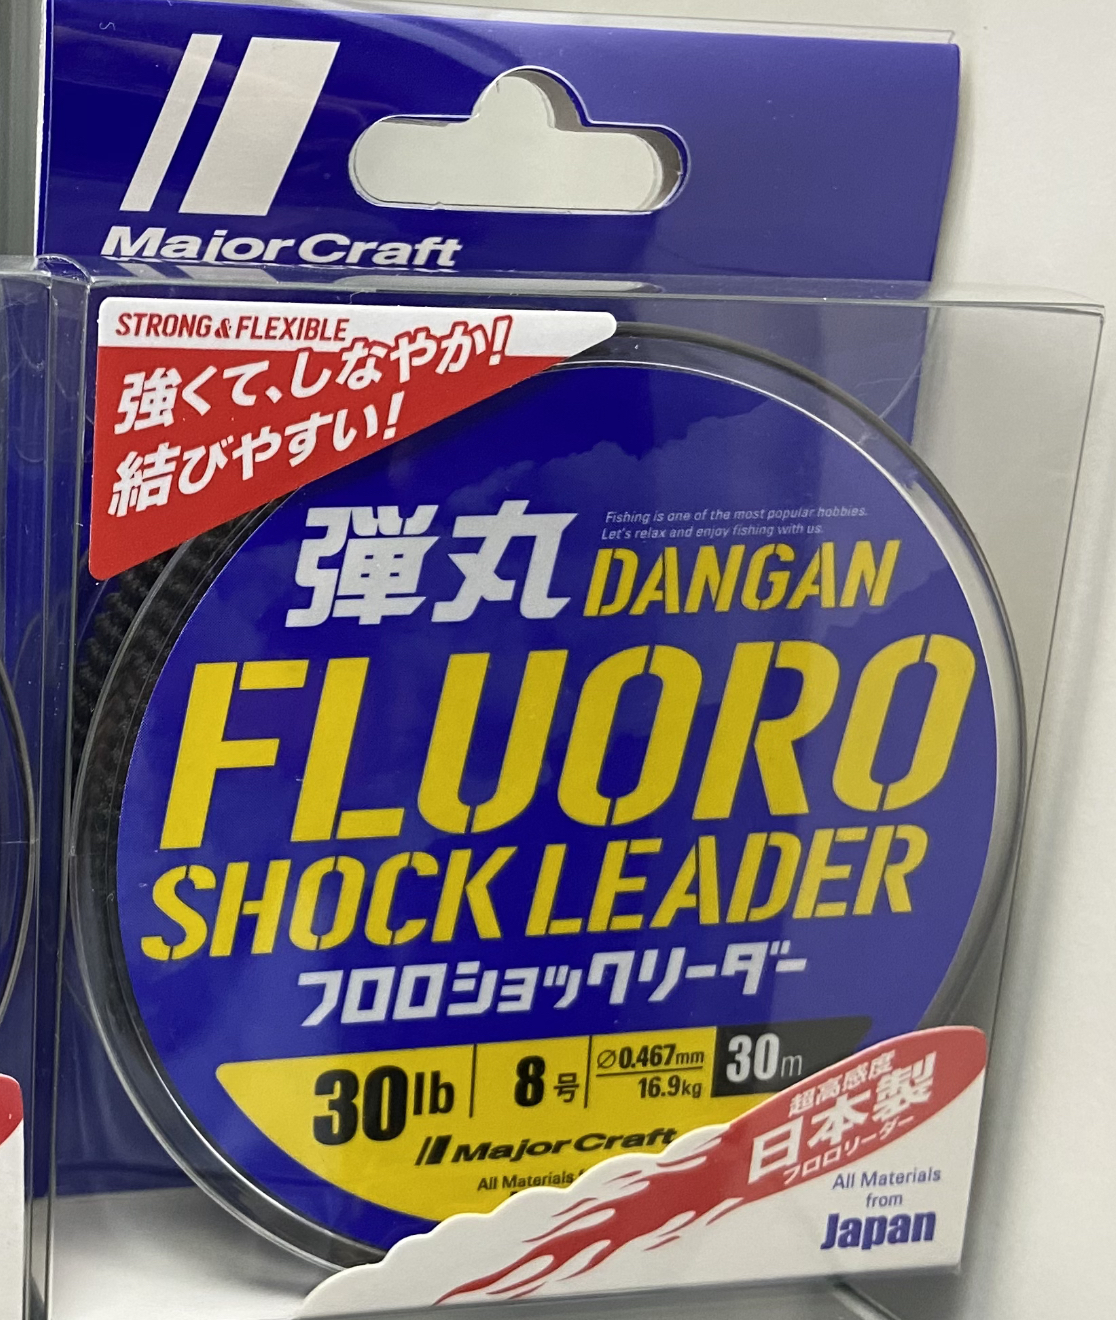 Fluorocarbono Major Craft Danga 0,467 mm